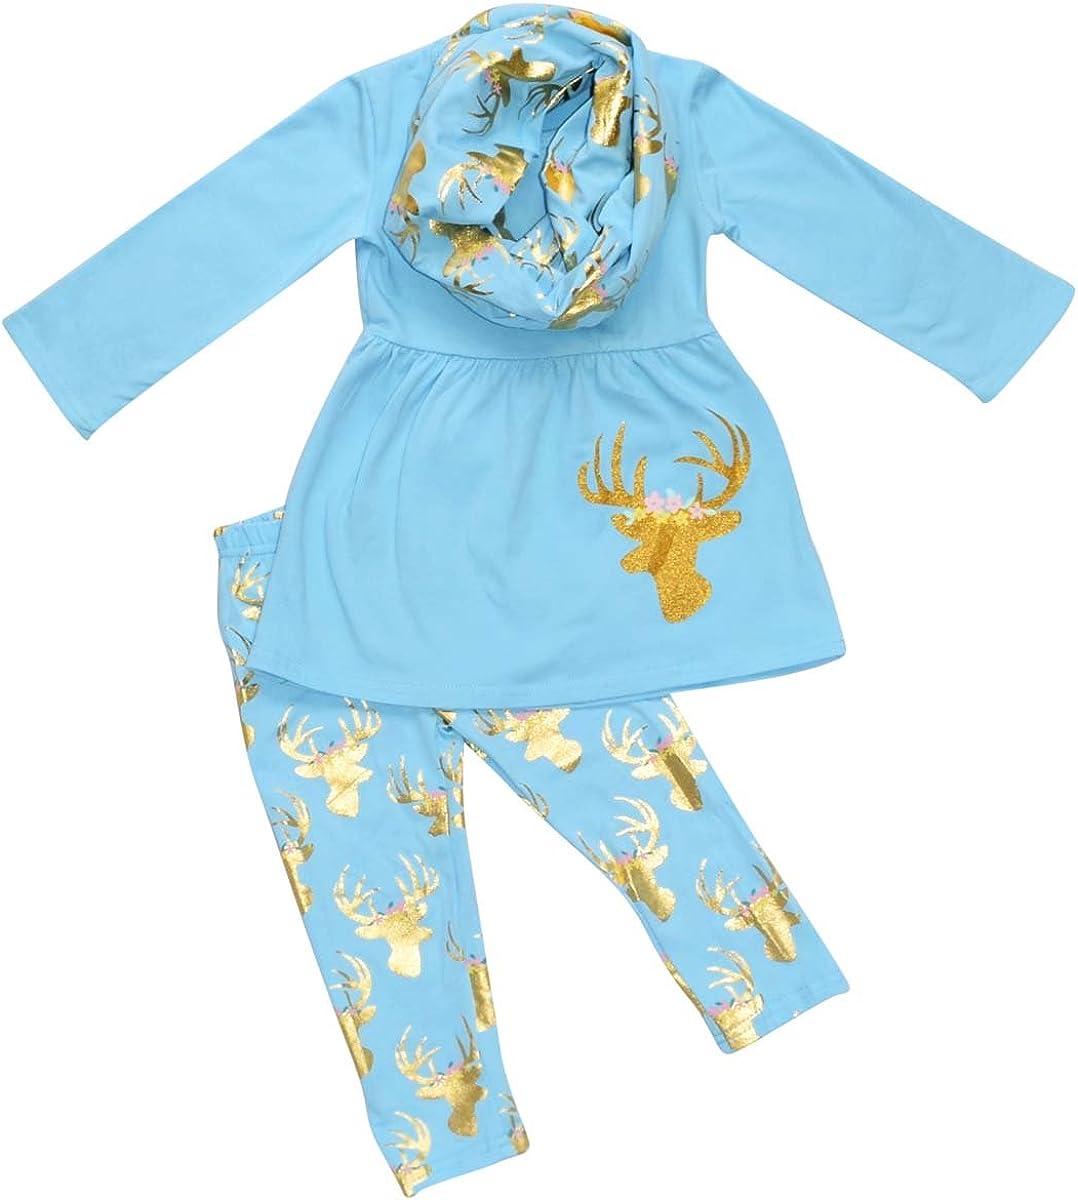 Detroit Mall Very popular! Unique Baby Girls Gold Moose Legging Spring Hunter Set